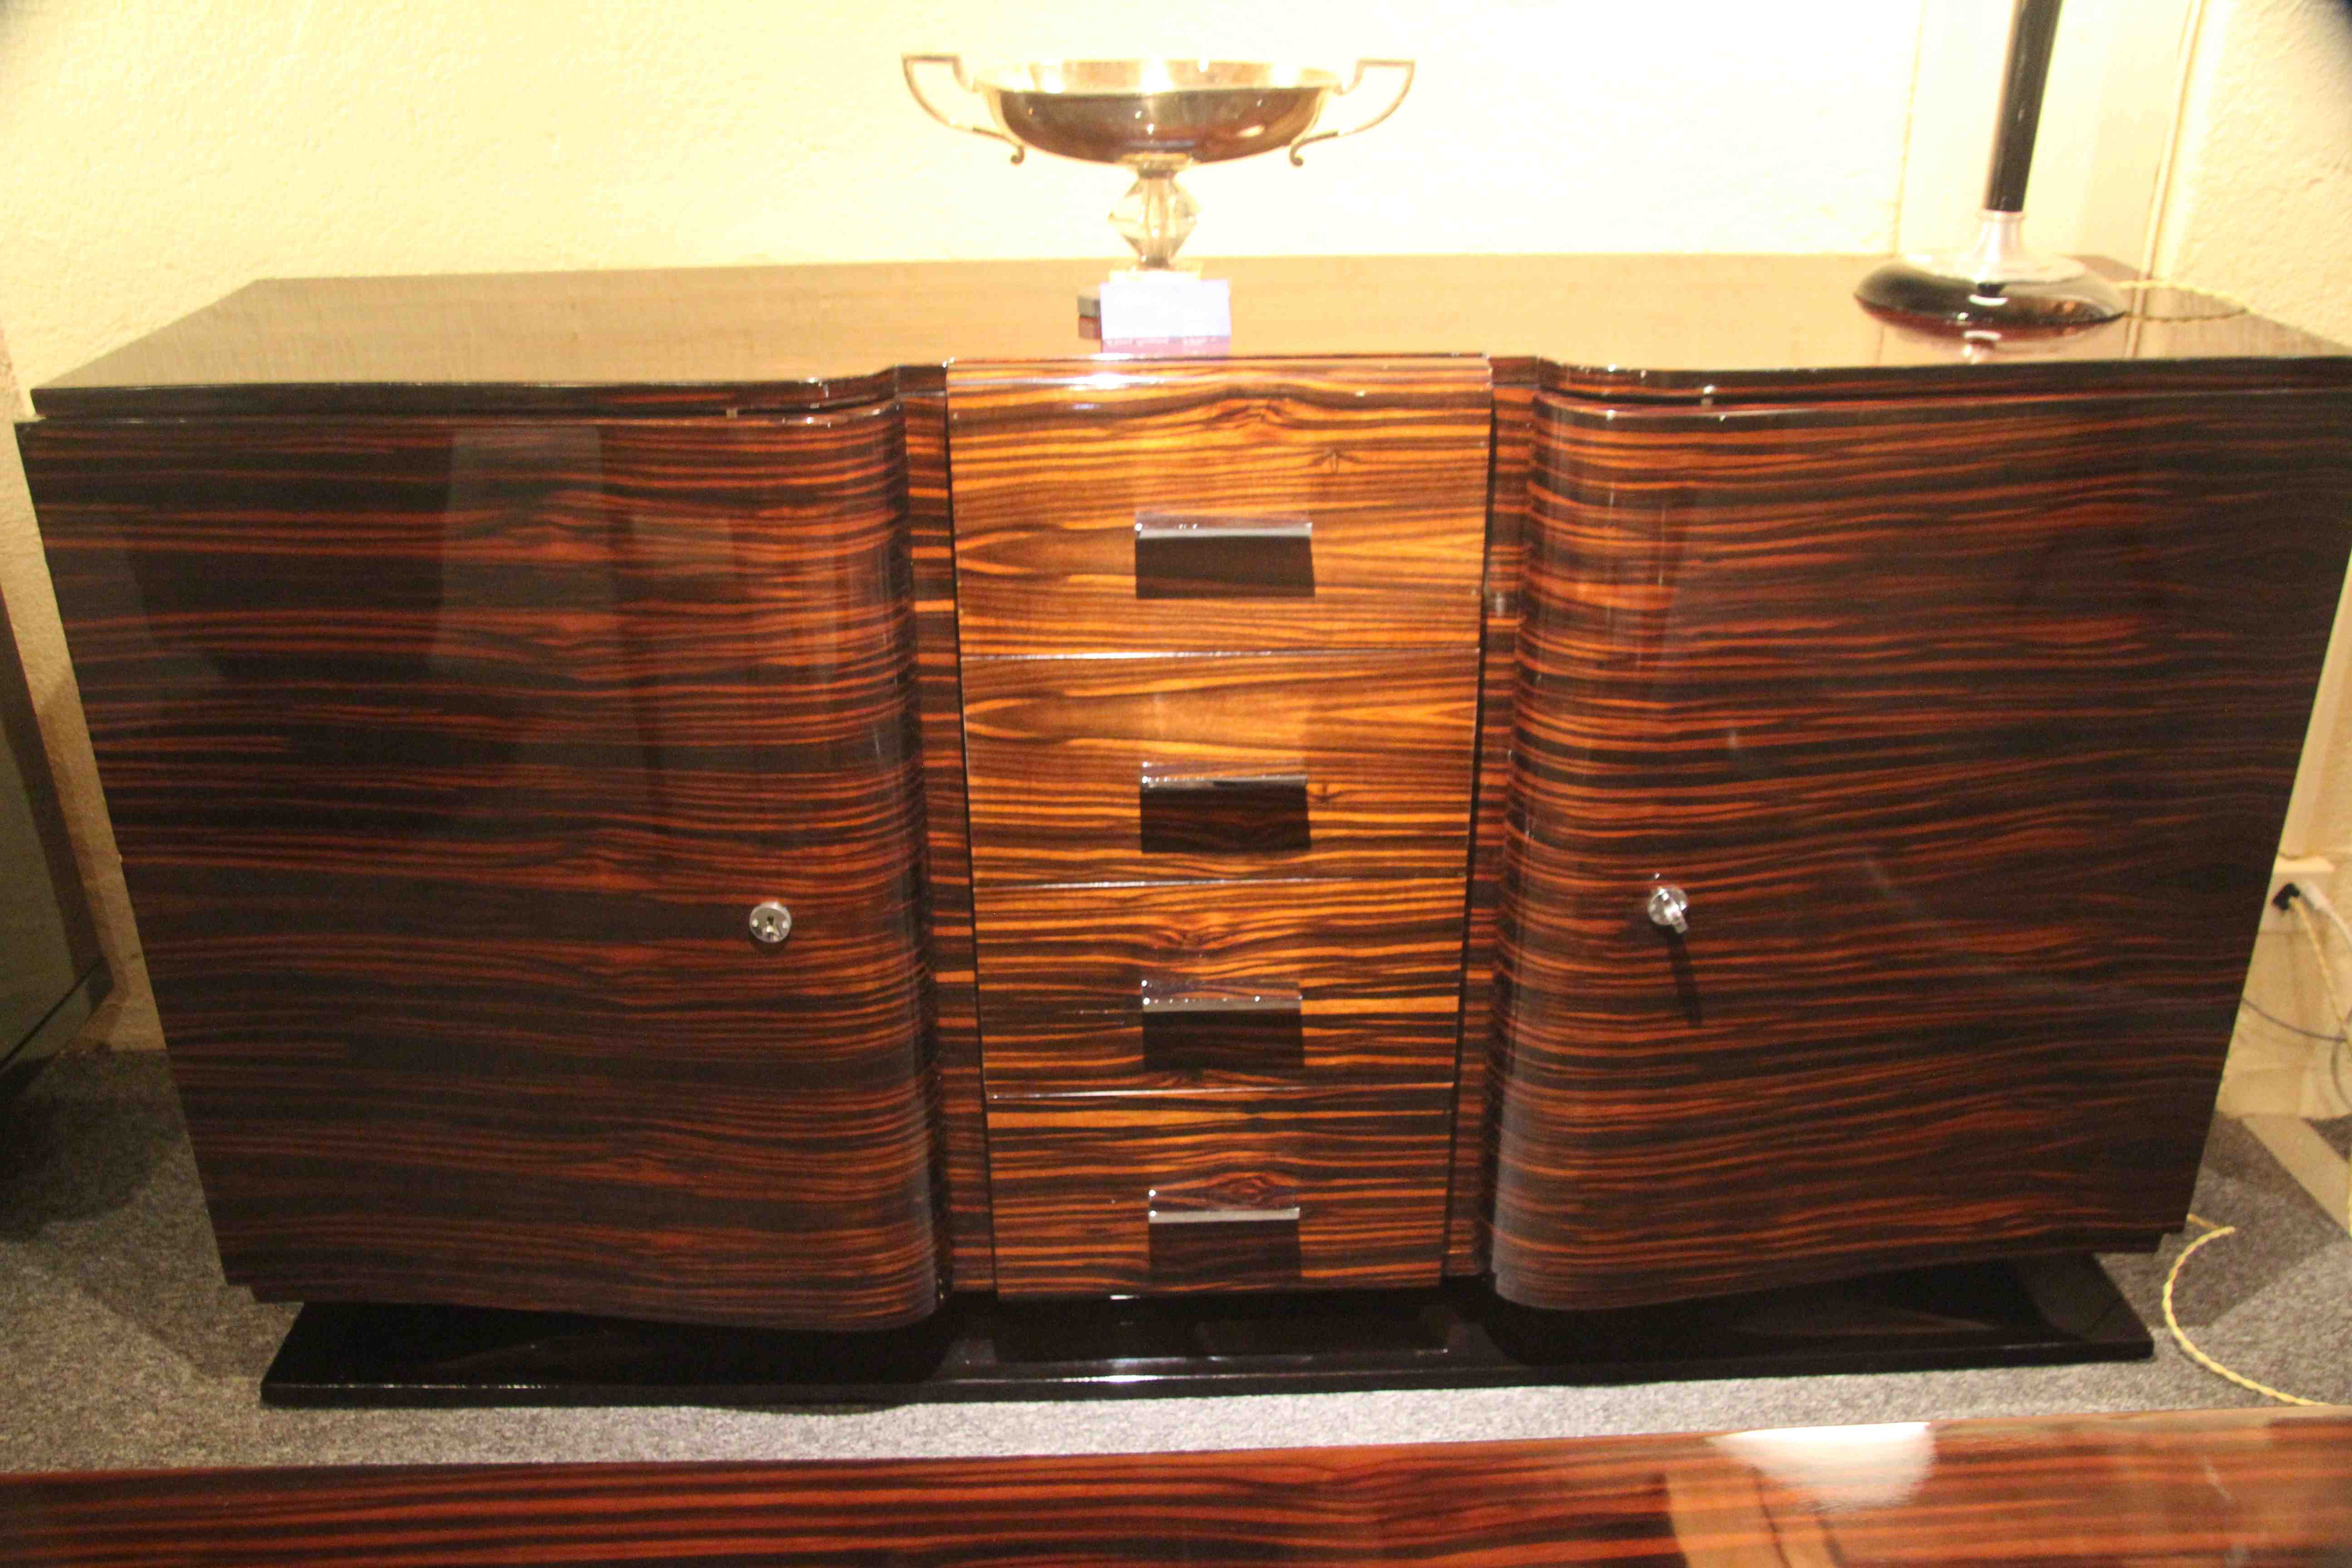 enfilade art deco en b ne de macassar ref enf 6 sideboard art deco macassar esprit art d co. Black Bedroom Furniture Sets. Home Design Ideas